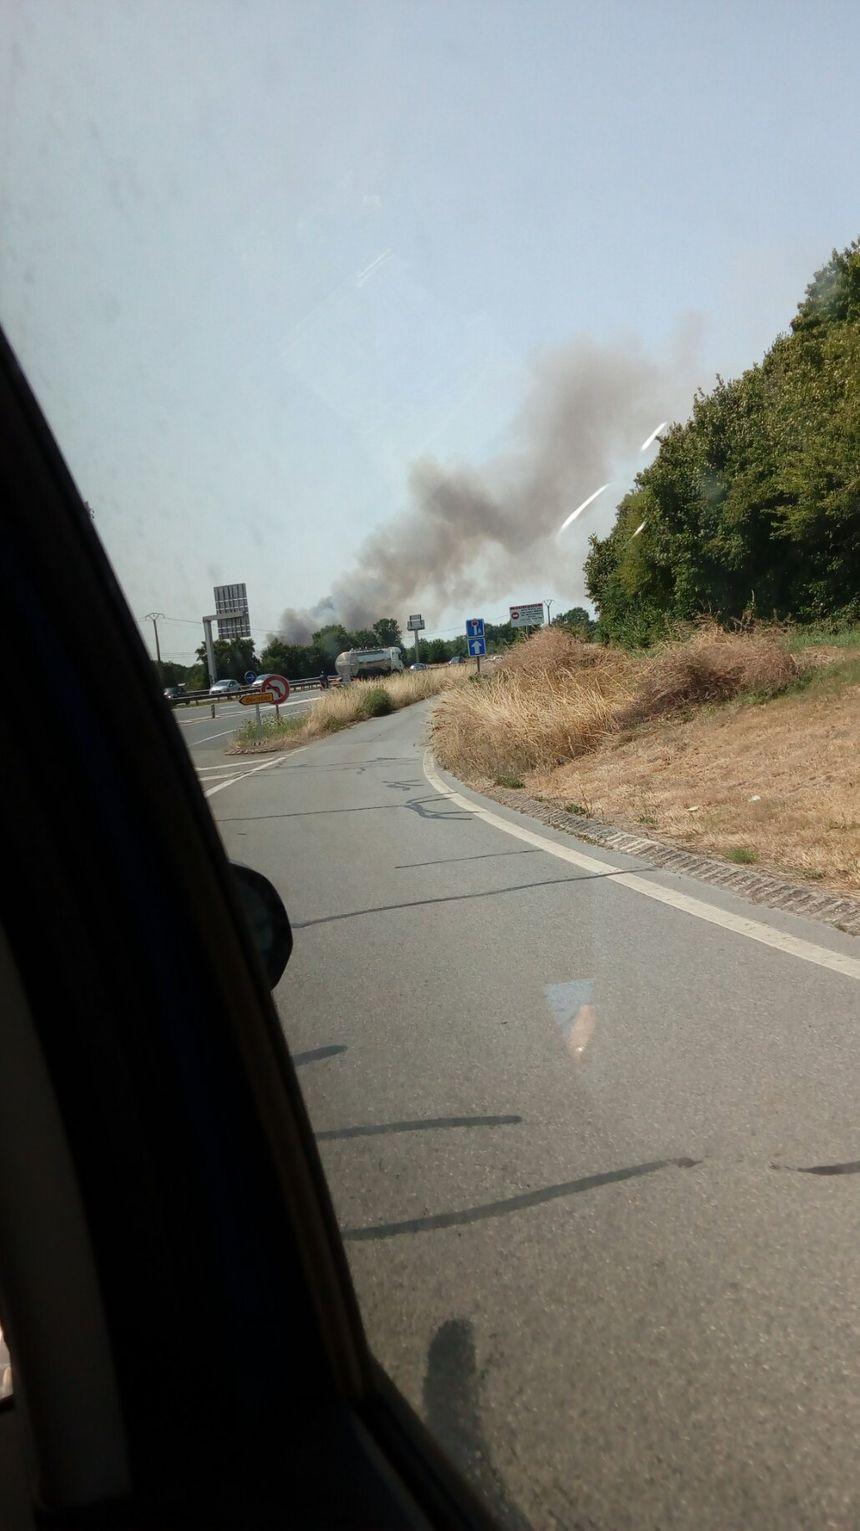 La fumée est visible depuis la rocade de Rennes